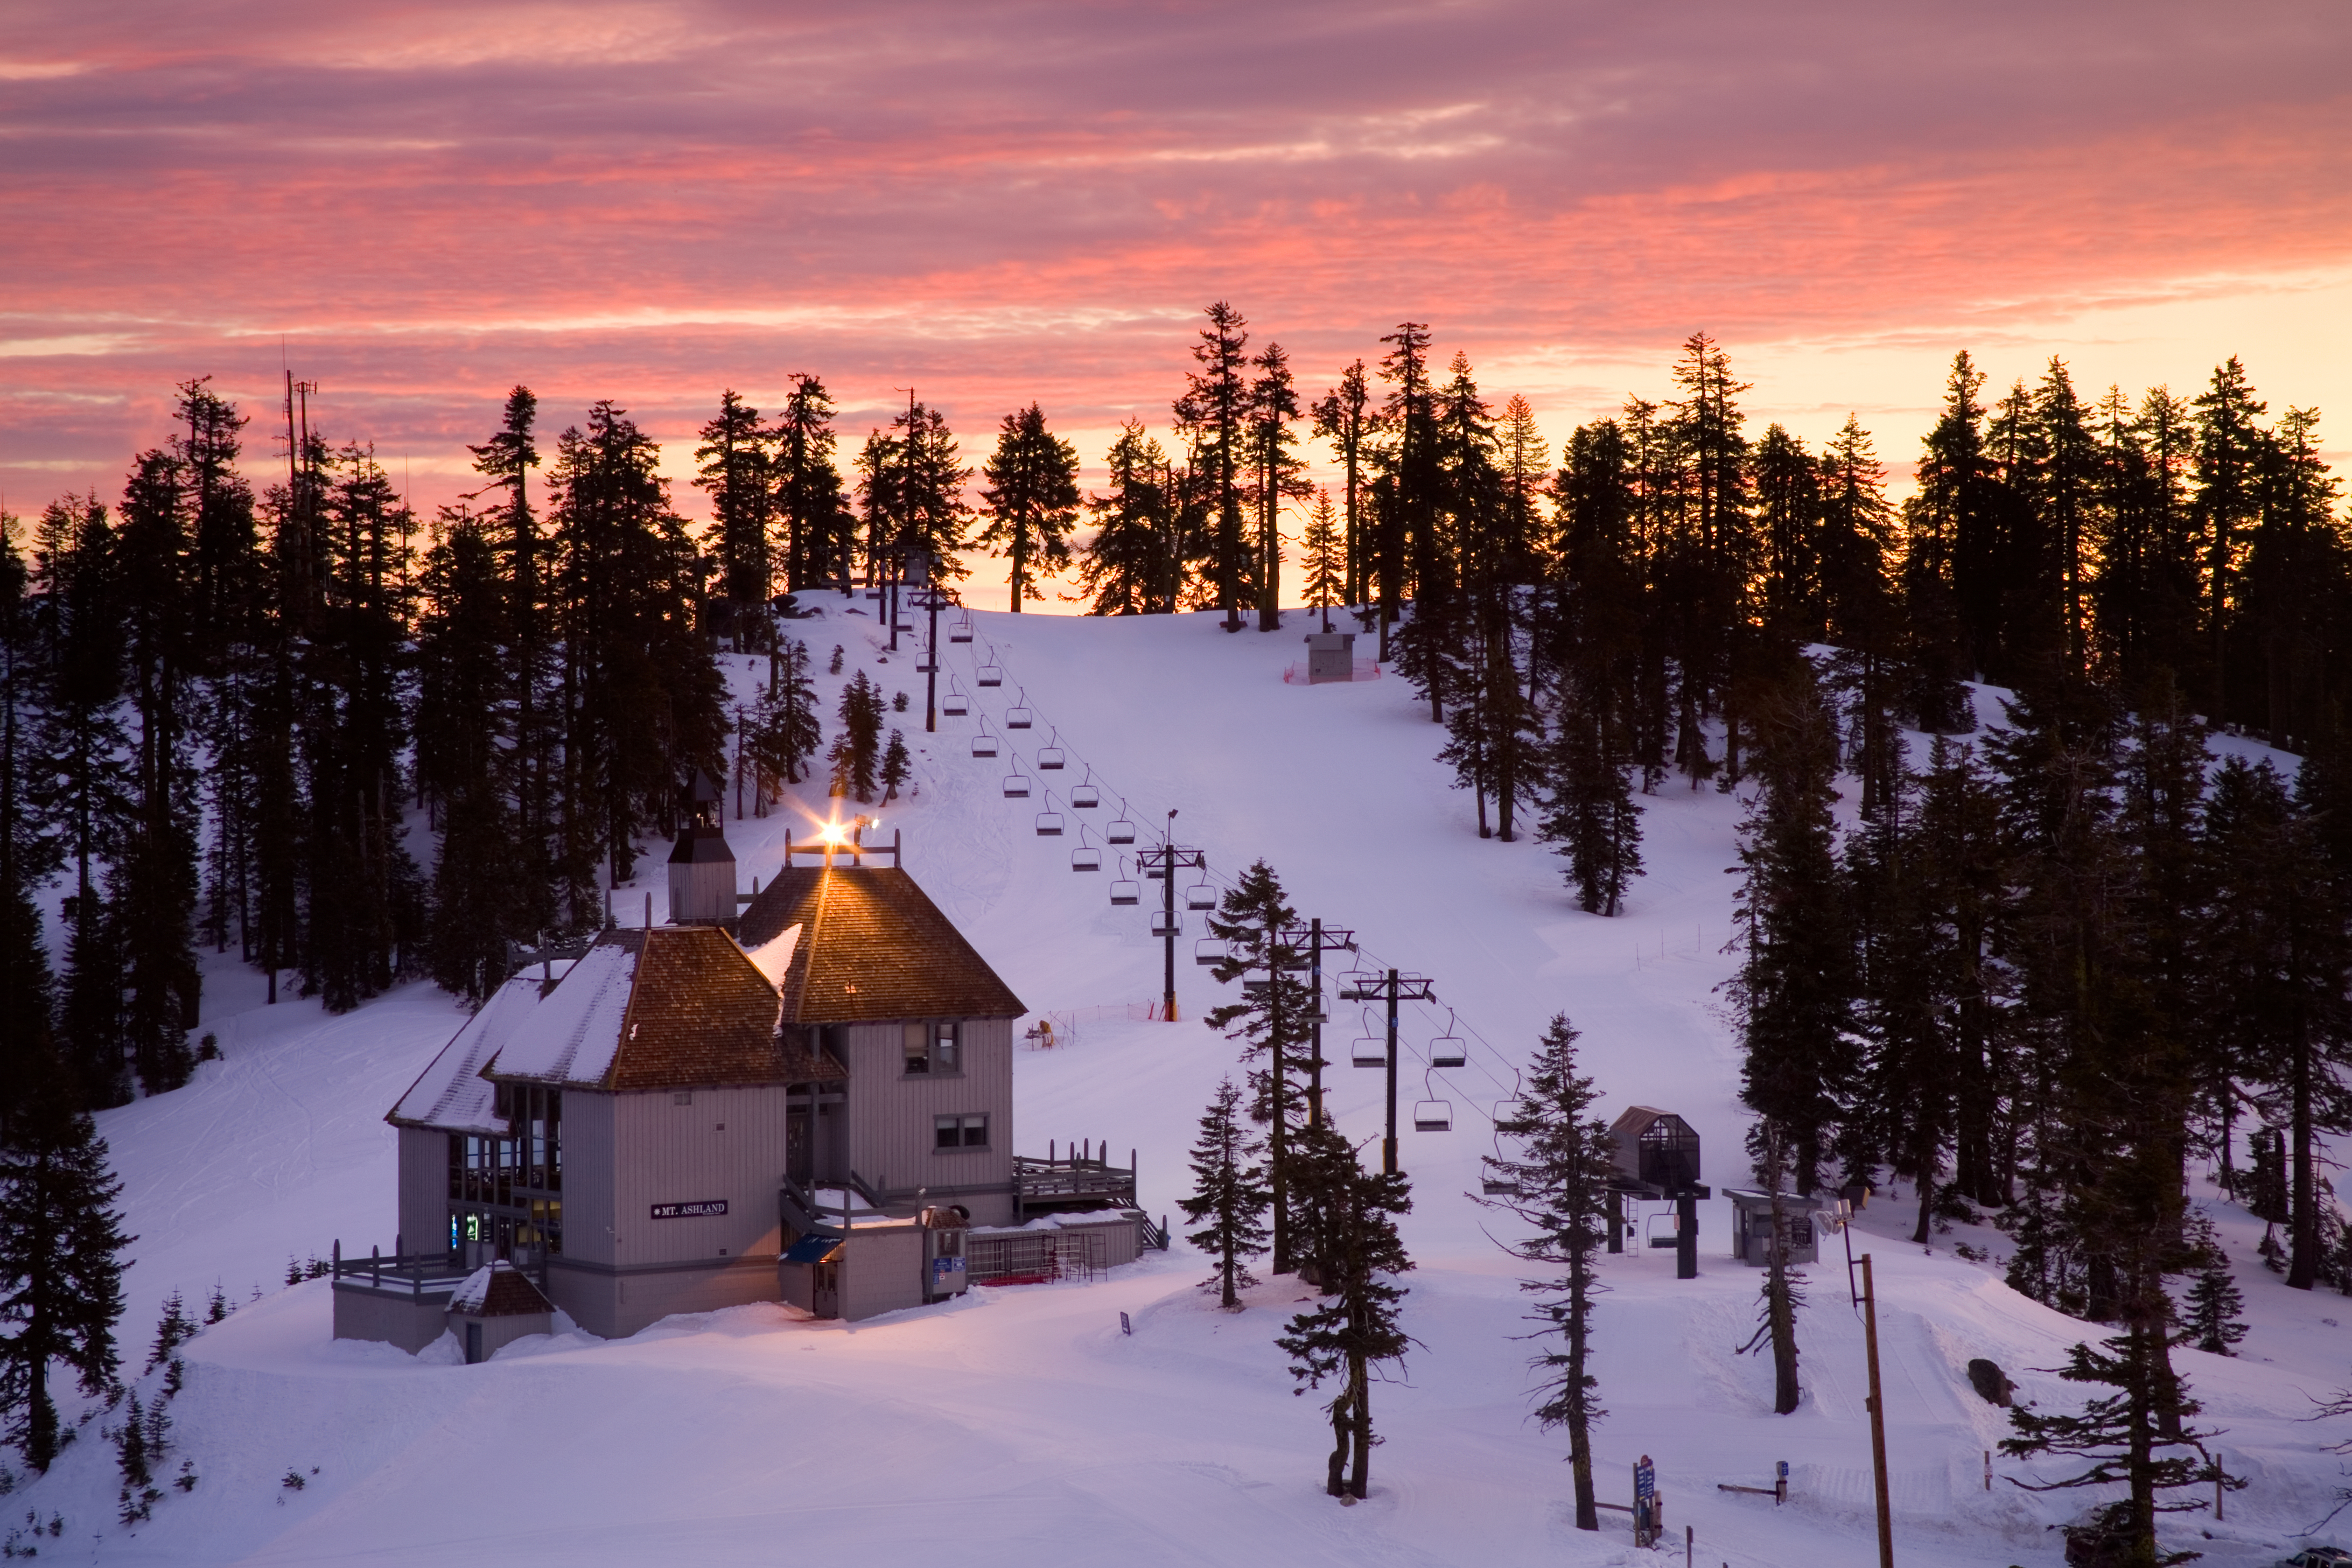 Mt. Ashland Ski Area - Mt. Ashland Ski Area